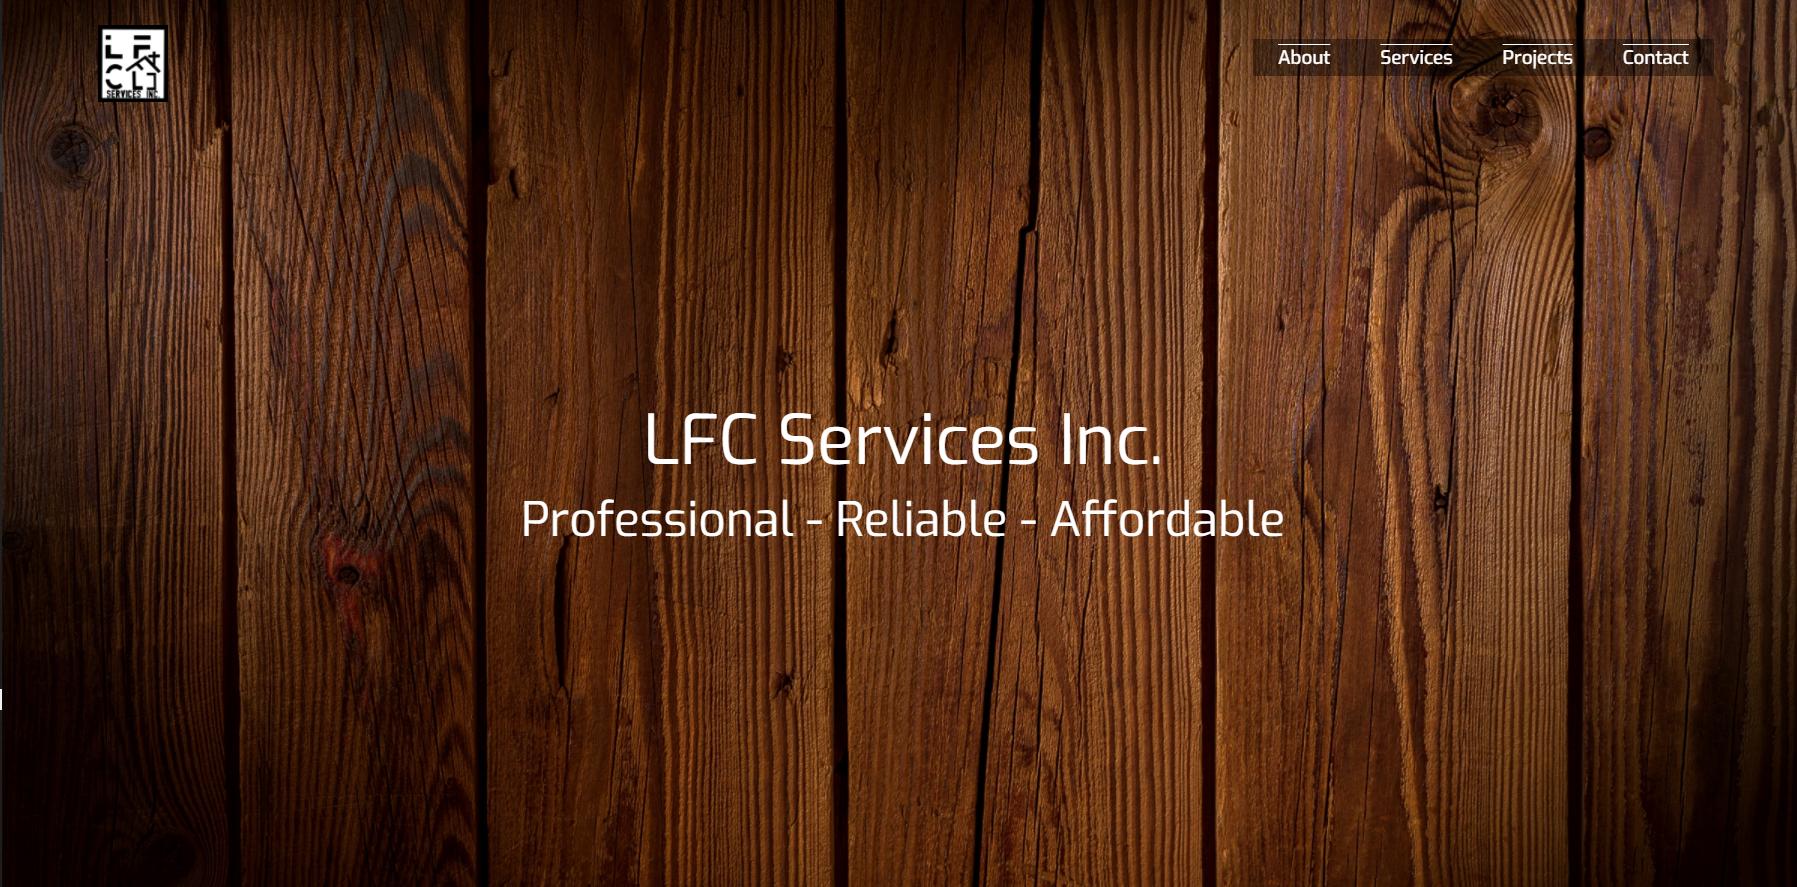 LFC Services Inc. web page